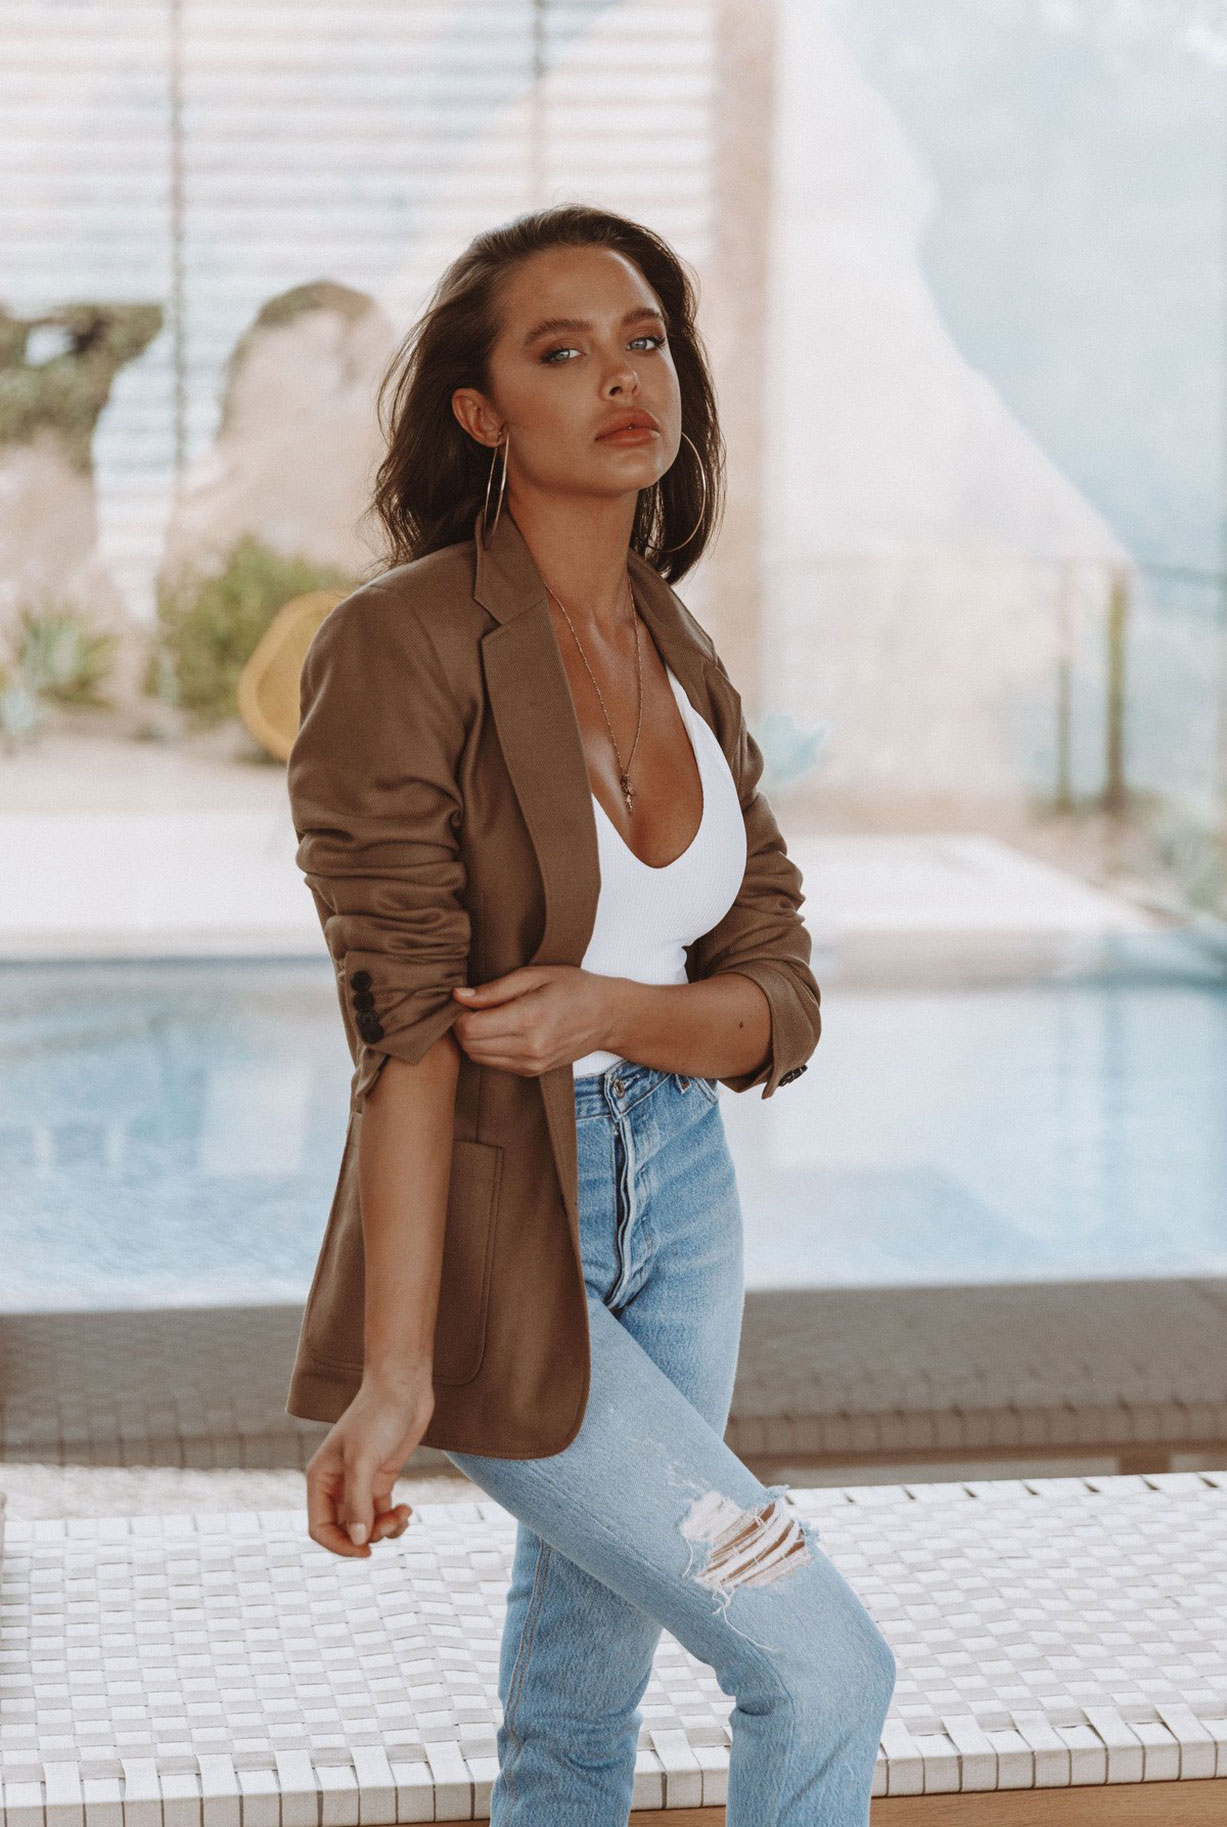 Мара Тиген в нижнем белье и купальниках модного бренда Gooseberry Intimates / фото 28